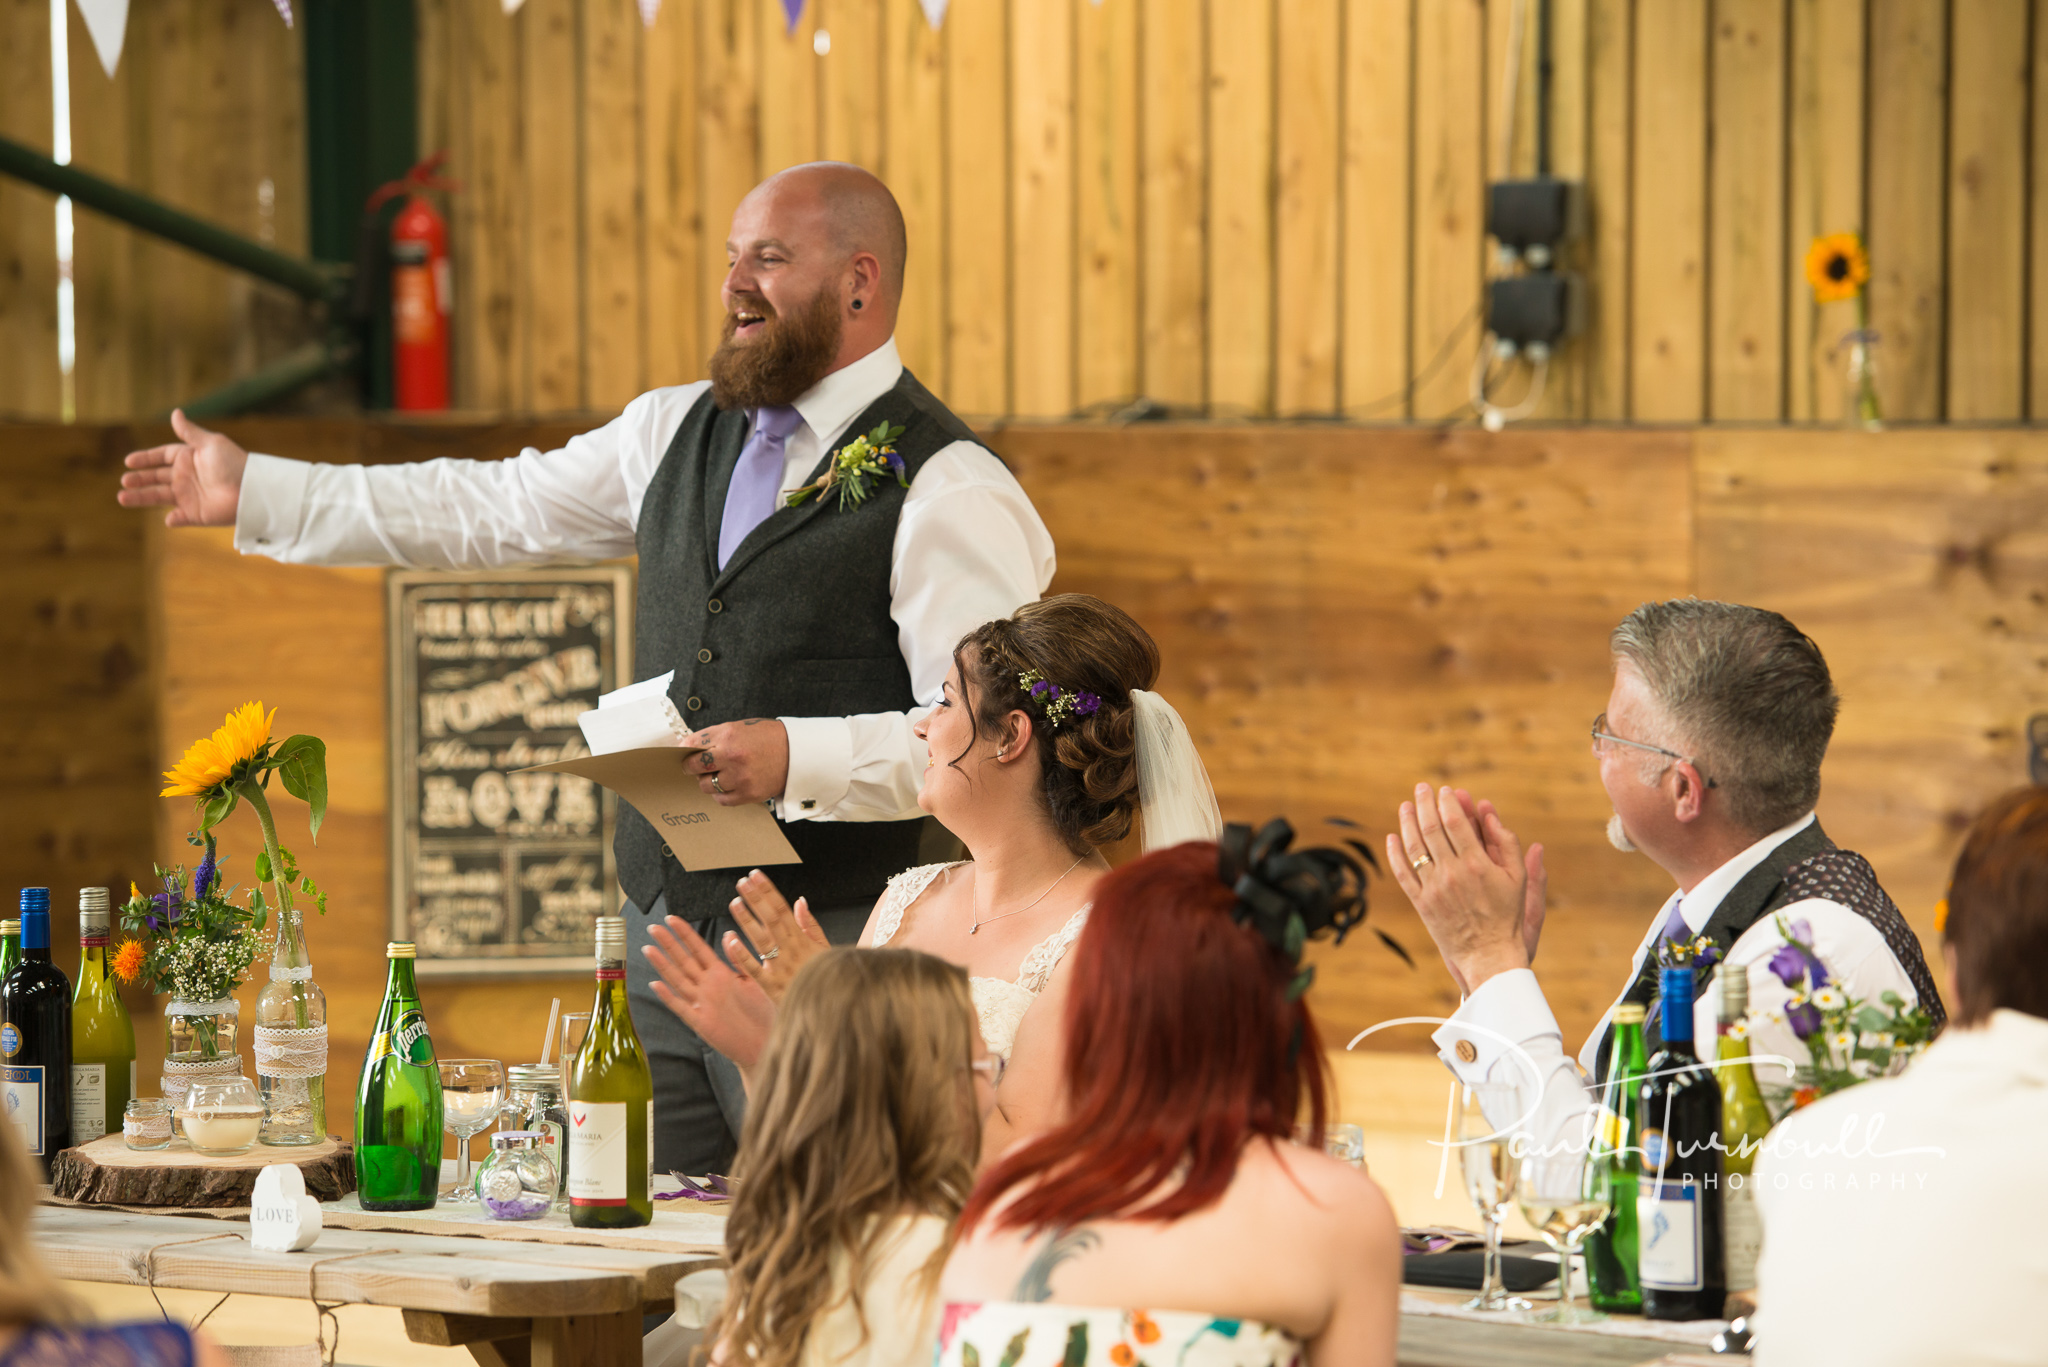 wedding-photographer-hilltop-farm-ilton-yorkshire-044.jpg